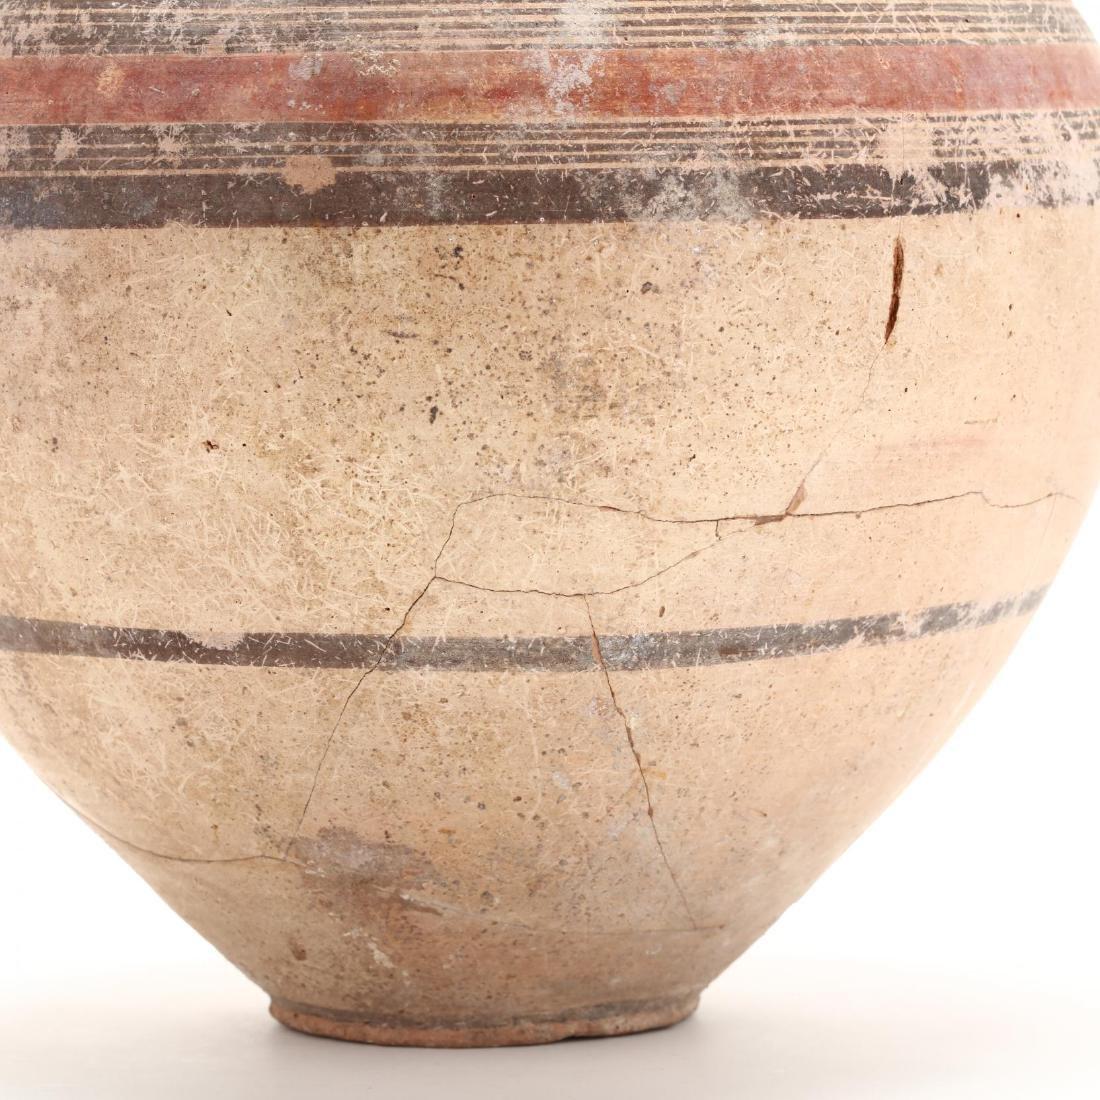 Cypro-Geometric Bichrome Amphora - 8